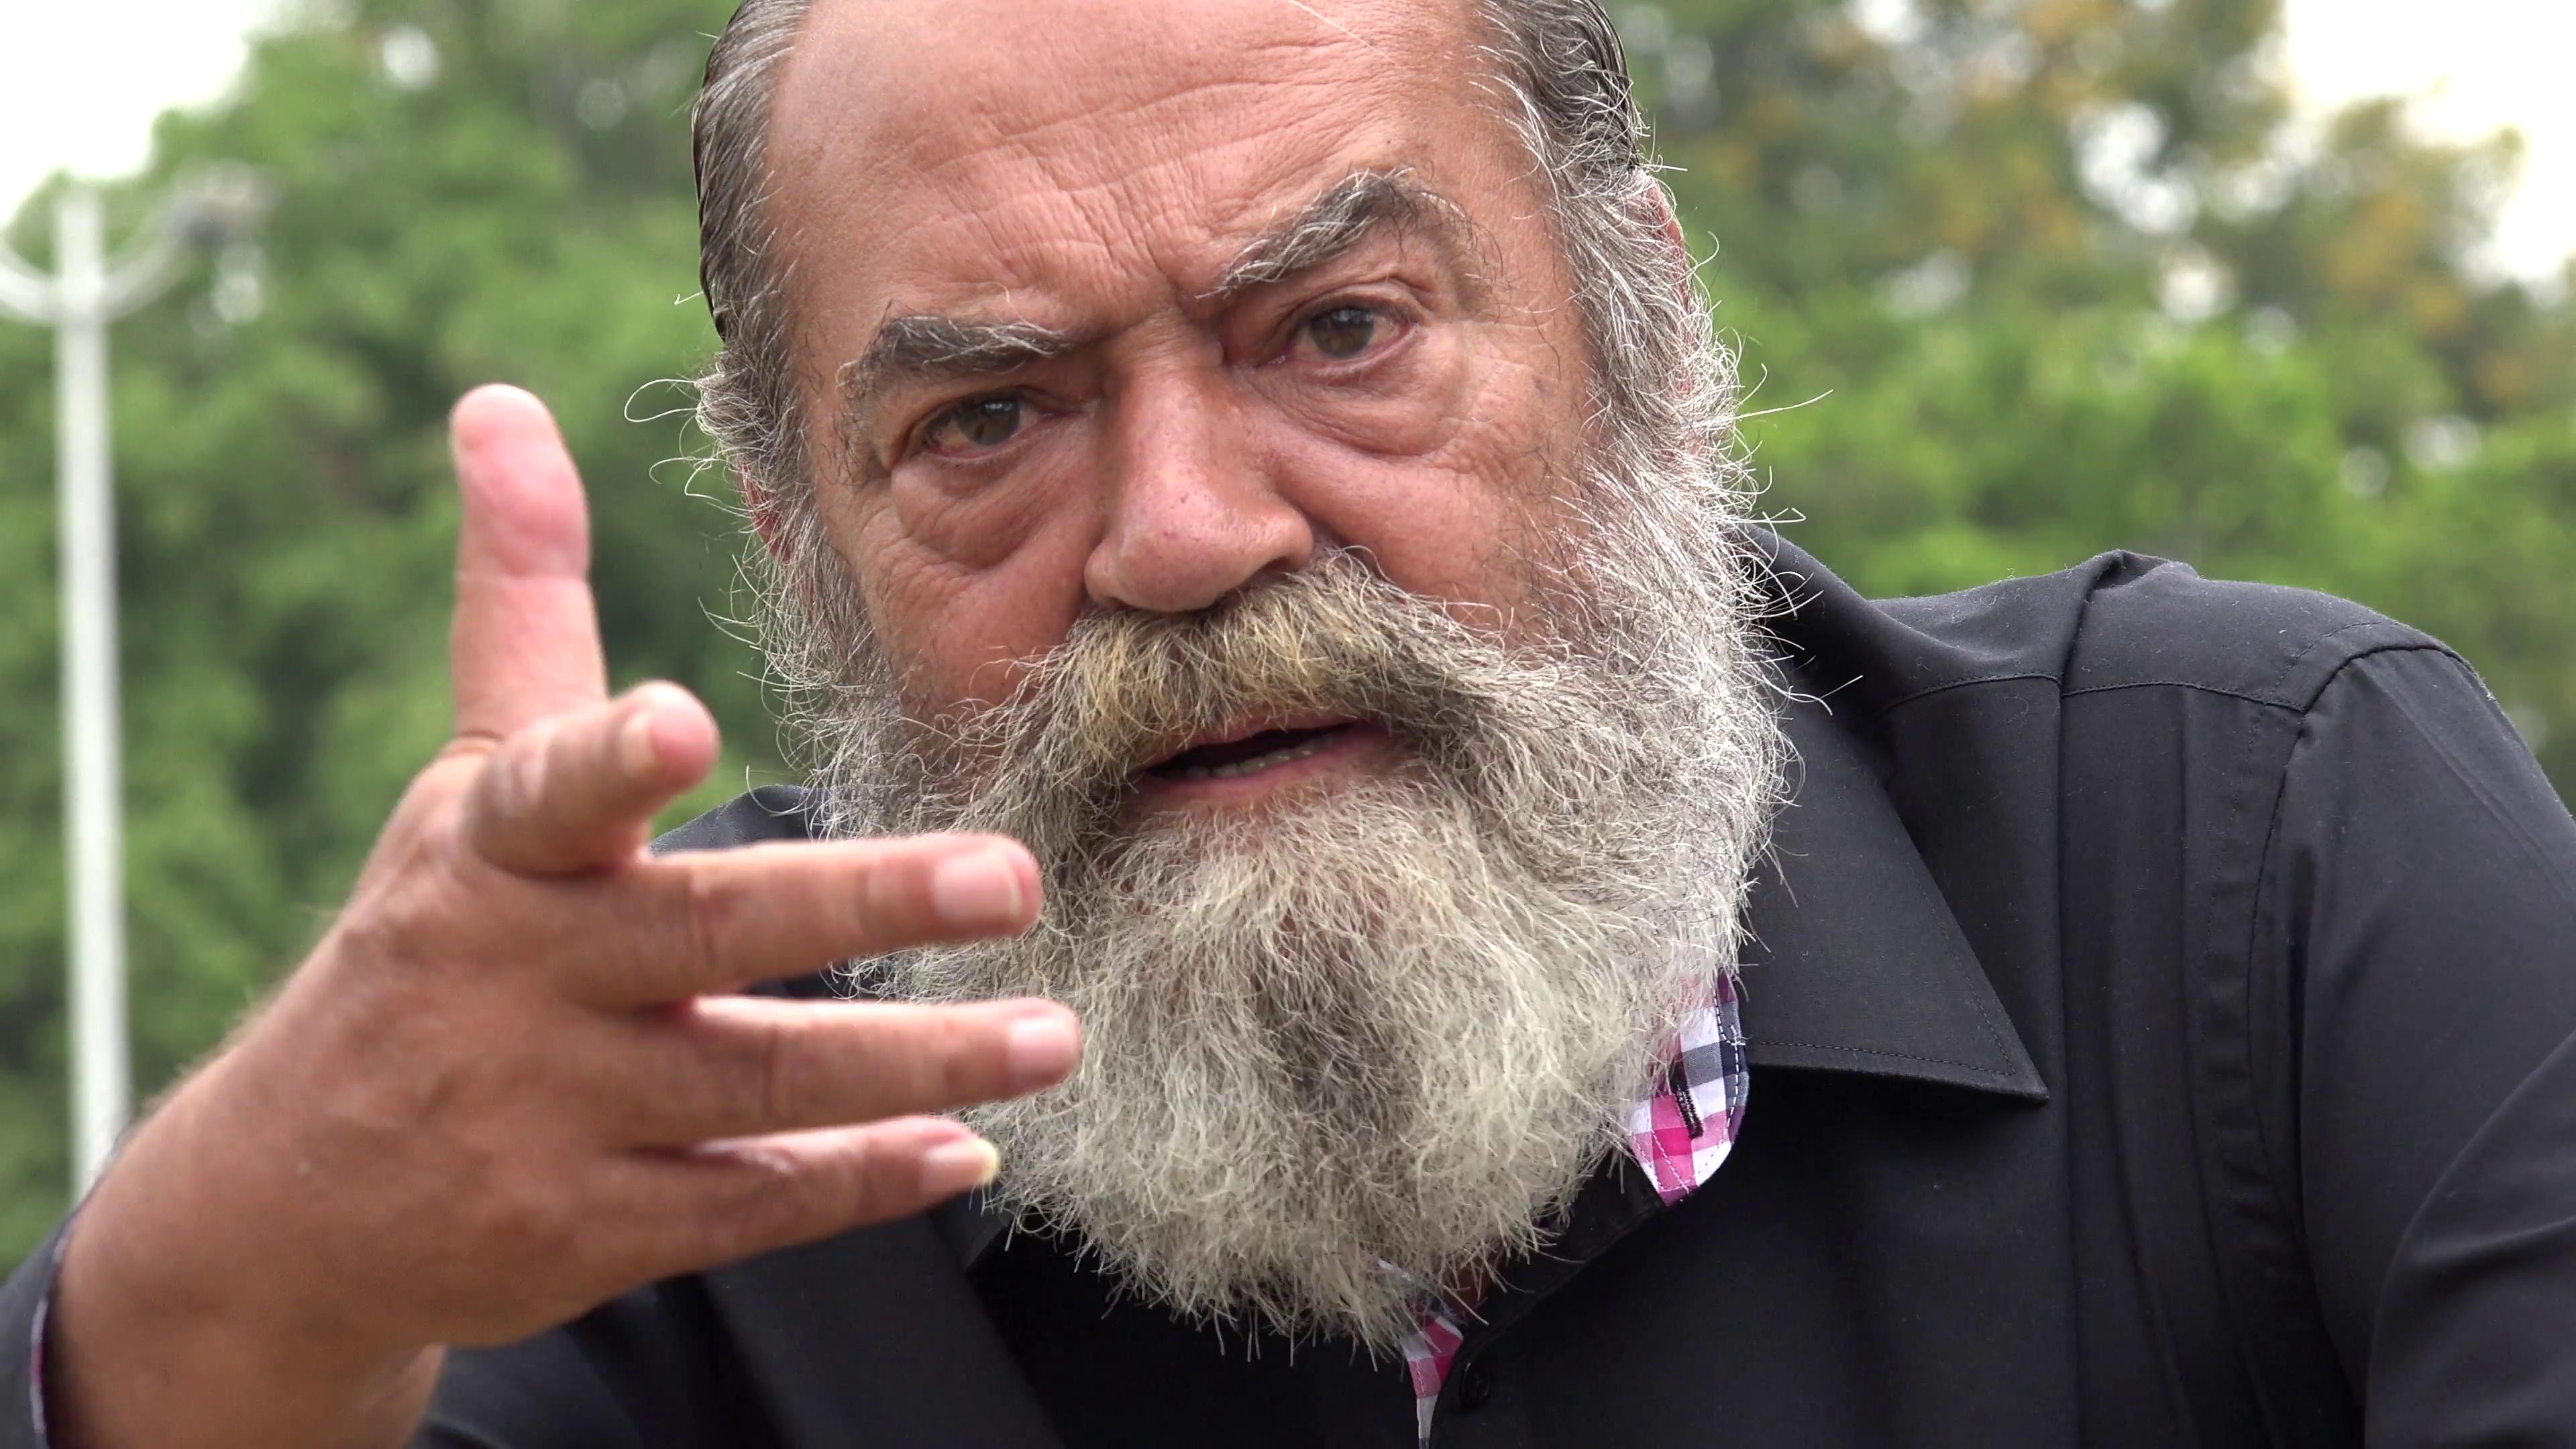 Old Bearded Man Talking Stock Video Footage - Videoblocks